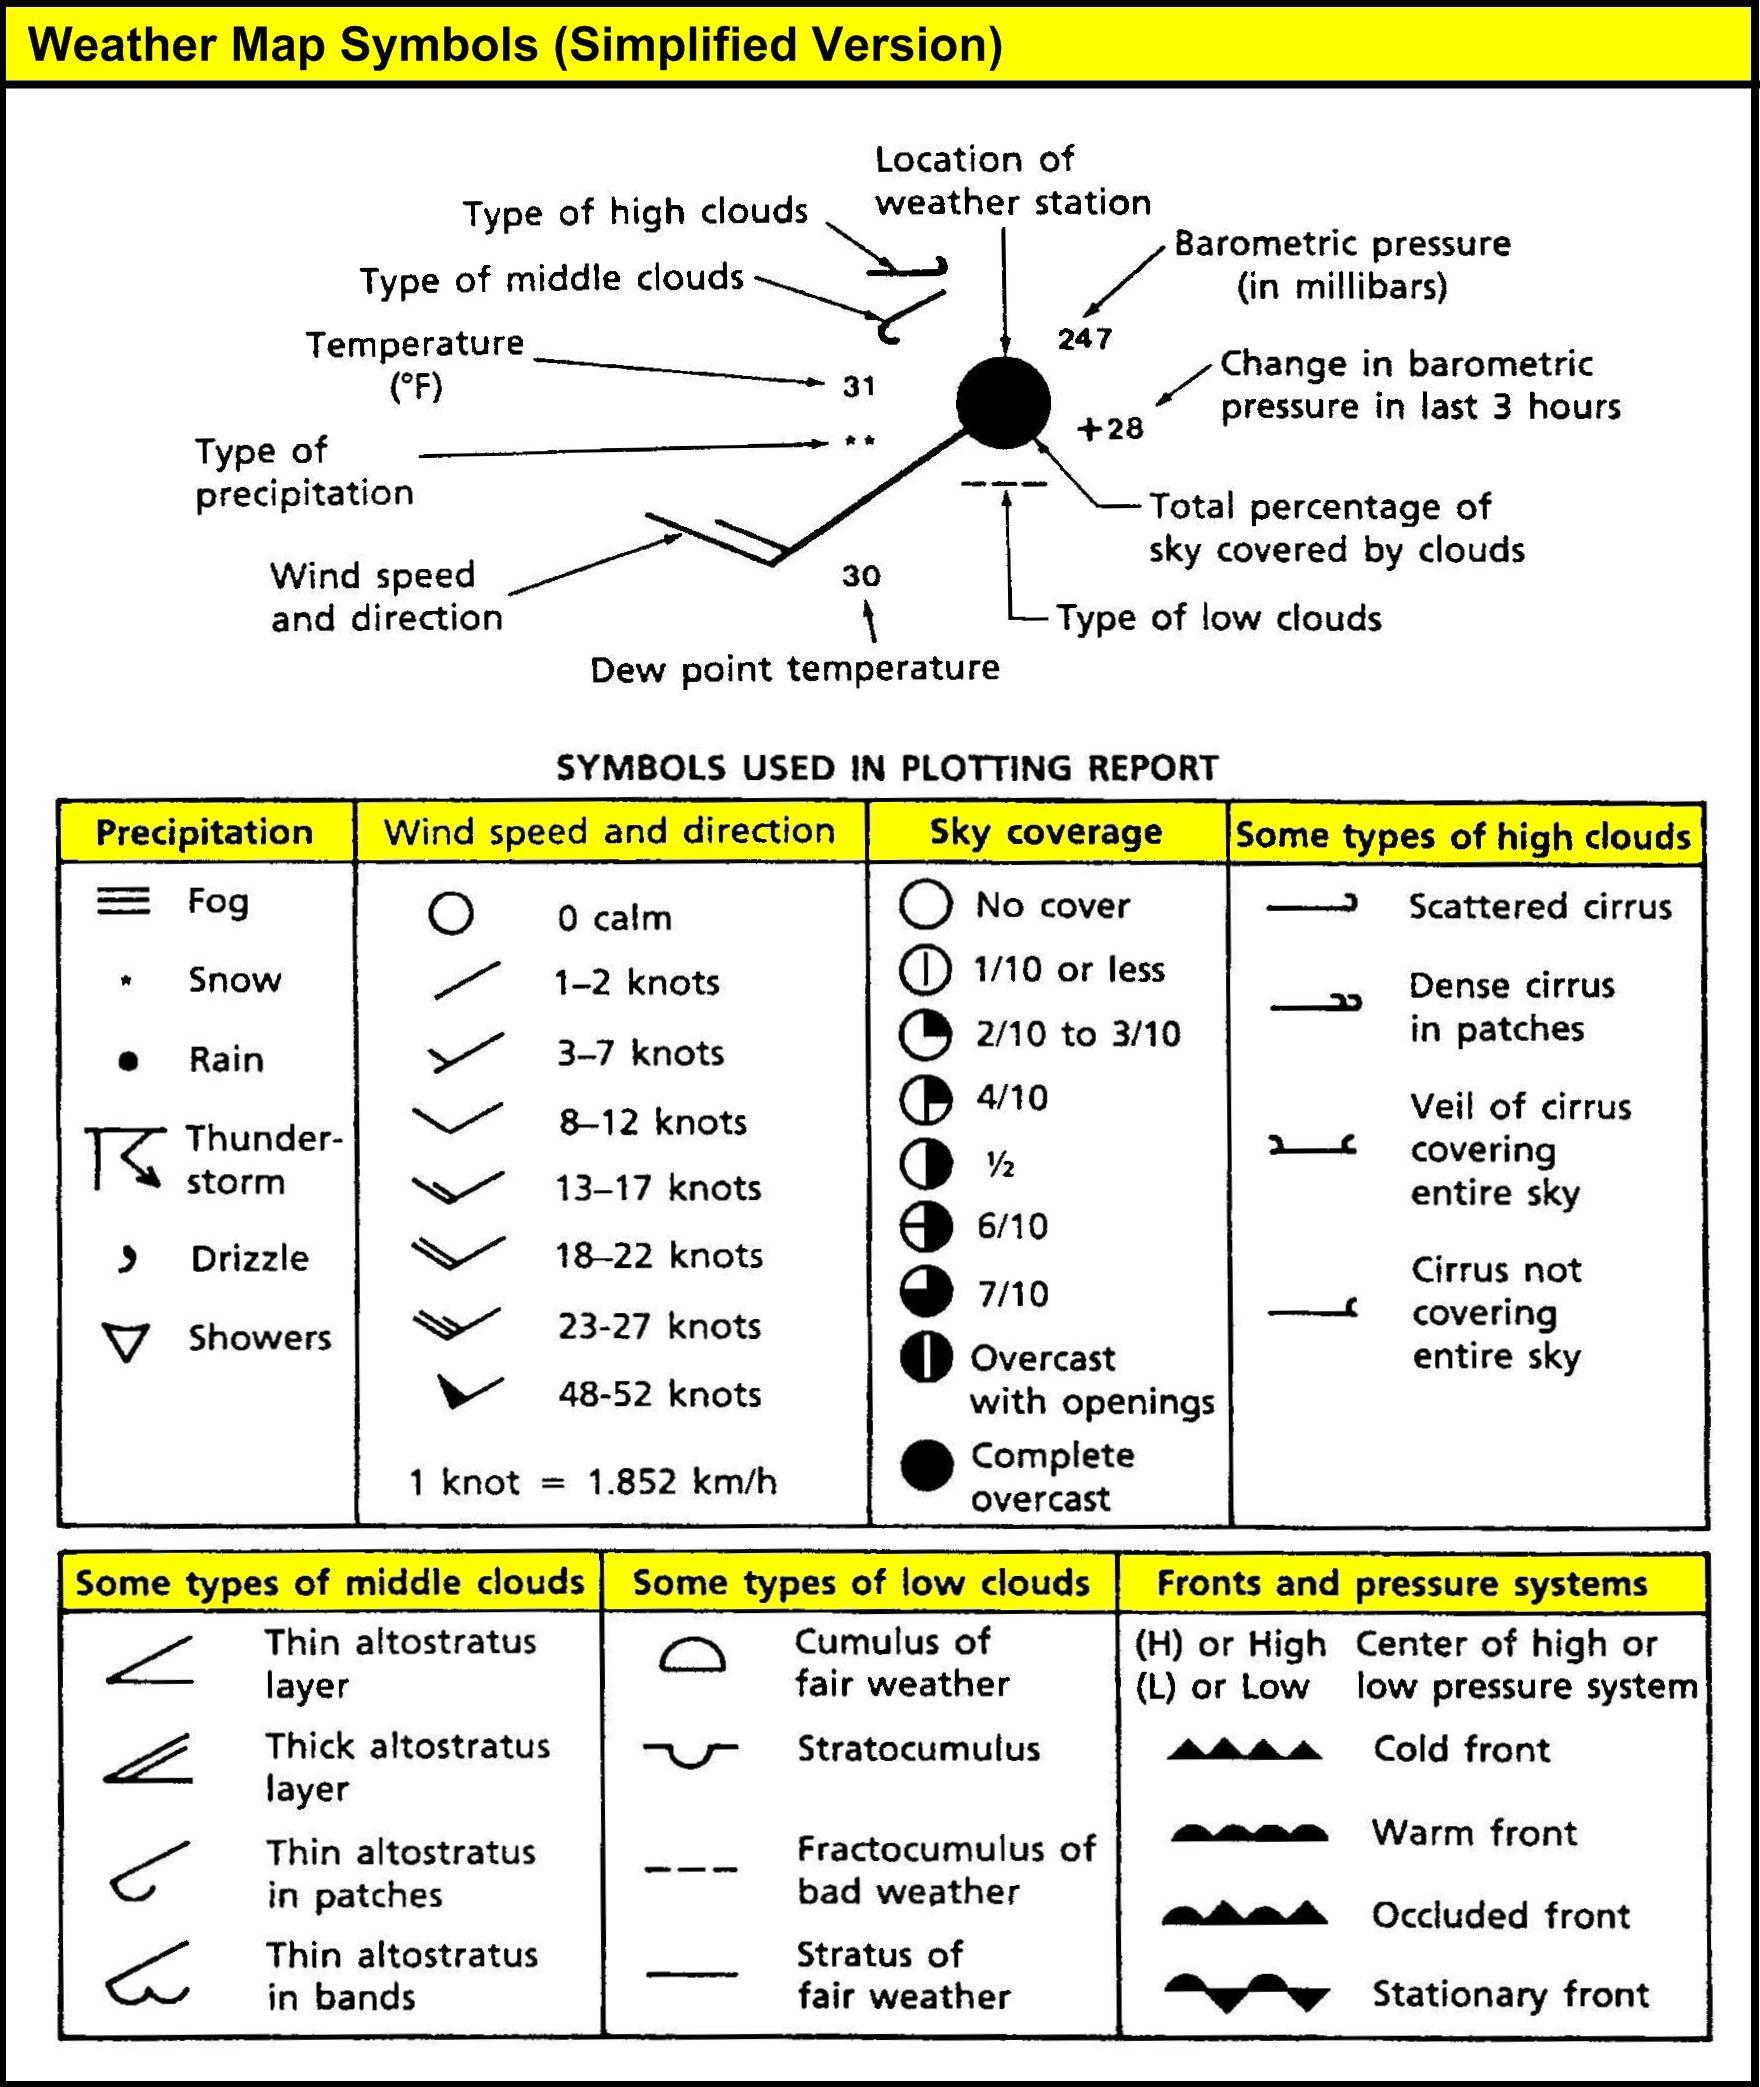 Synoptic weather chart symbols gallery symbols and meanings weather map symbolsg 17602087 weather pinterest earth weather map symbolsg 17602087 biocorpaavc gallery buycottarizona Gallery